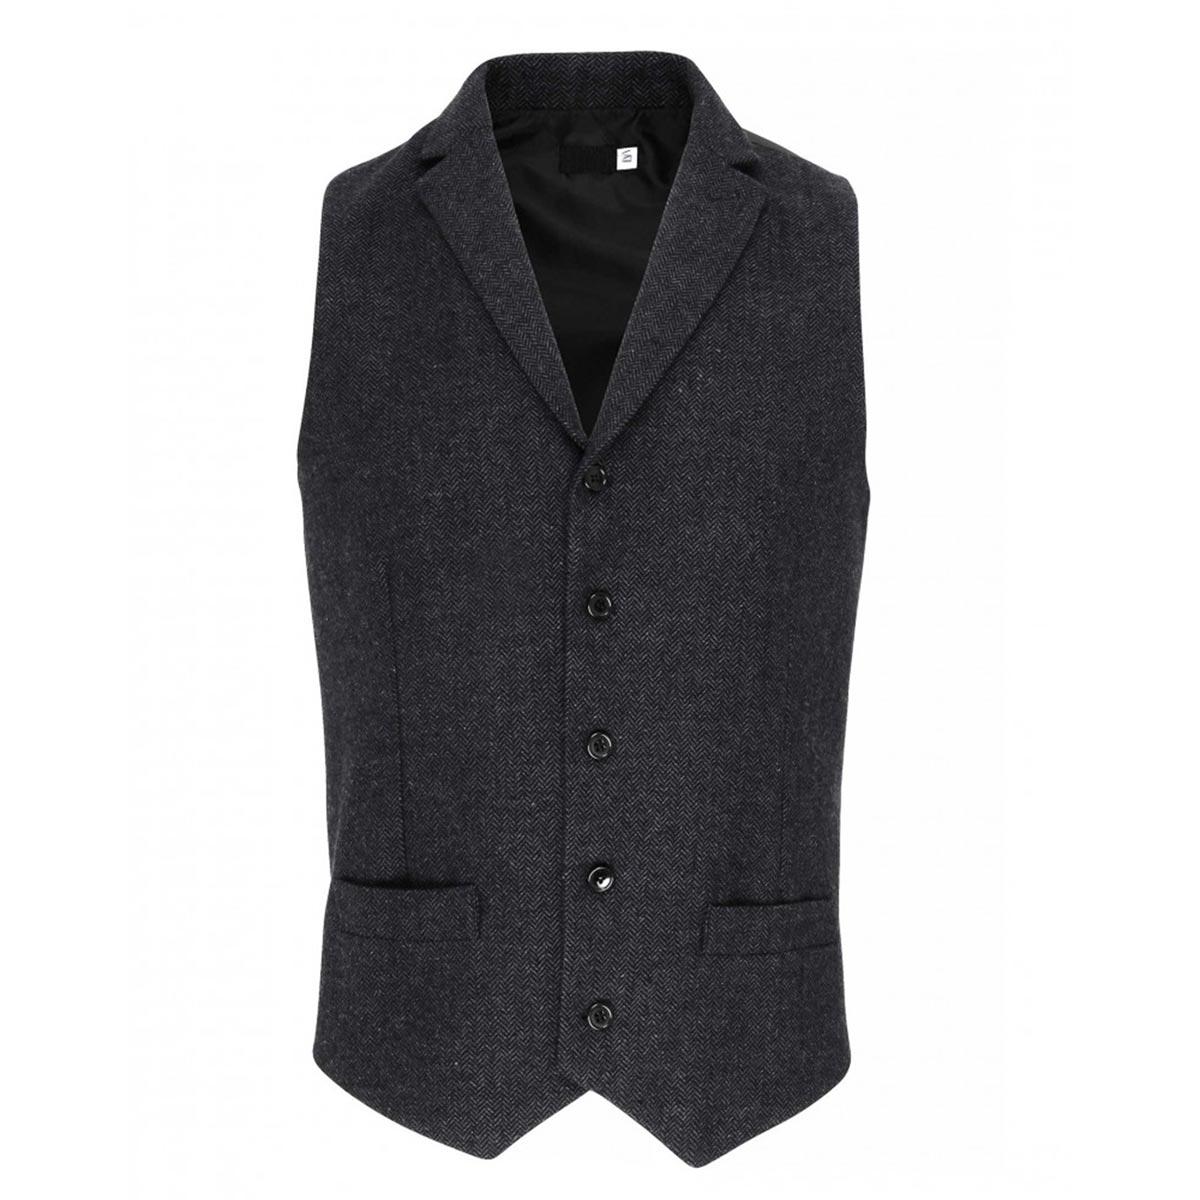 Mens Herringbone Waistcoat - pr625_charcoal_ft_5